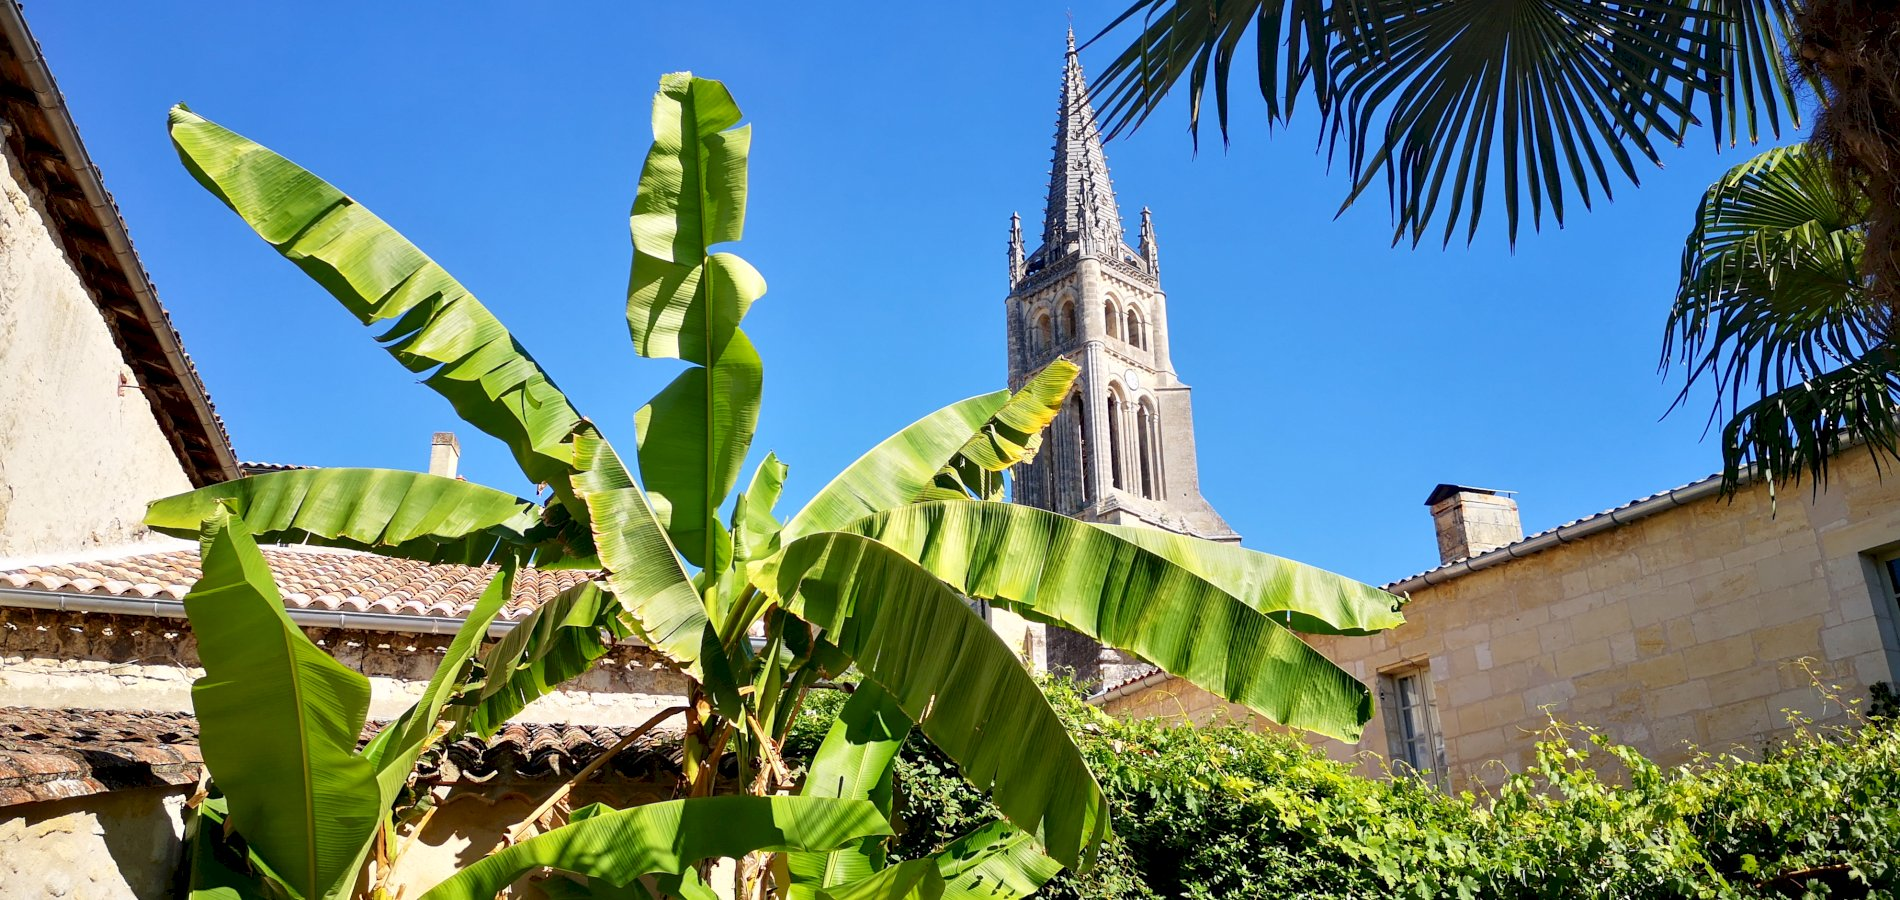 Ophorus Tours - Saint Emilion Wine Tour Private Full Day Trip from Bordeaux